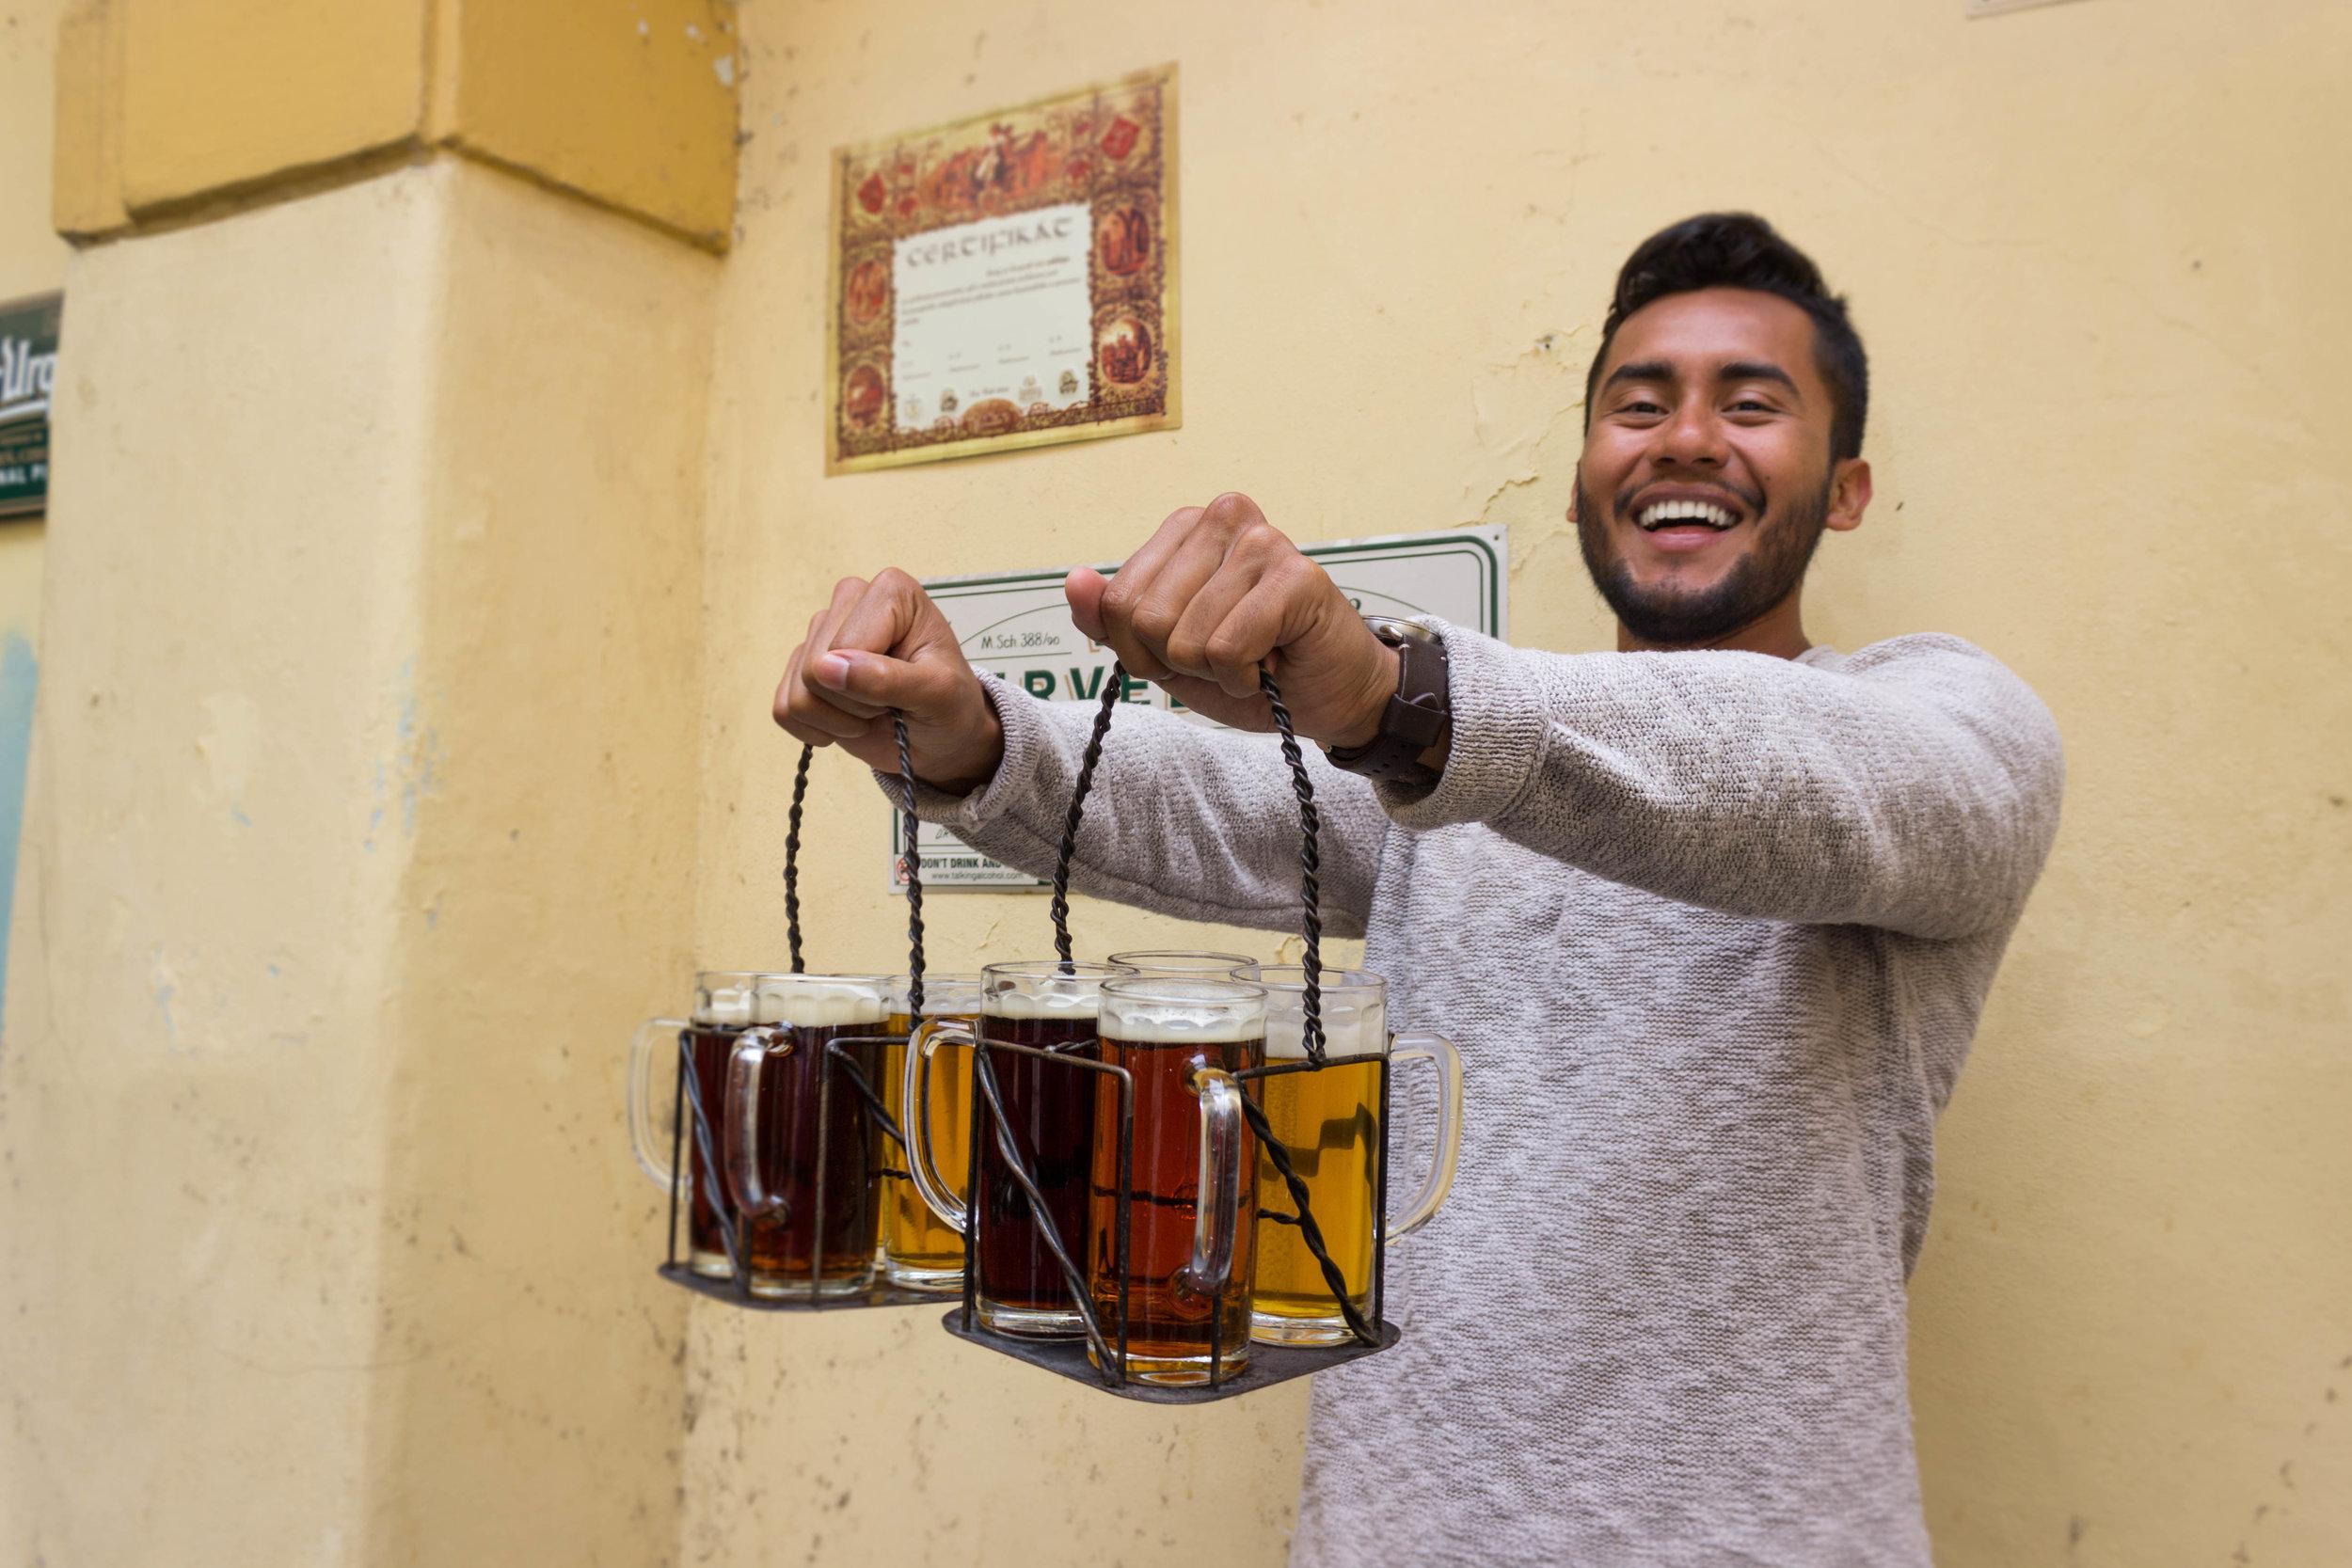 Luis having a great time during the beer tasting at Prague Beer Museum